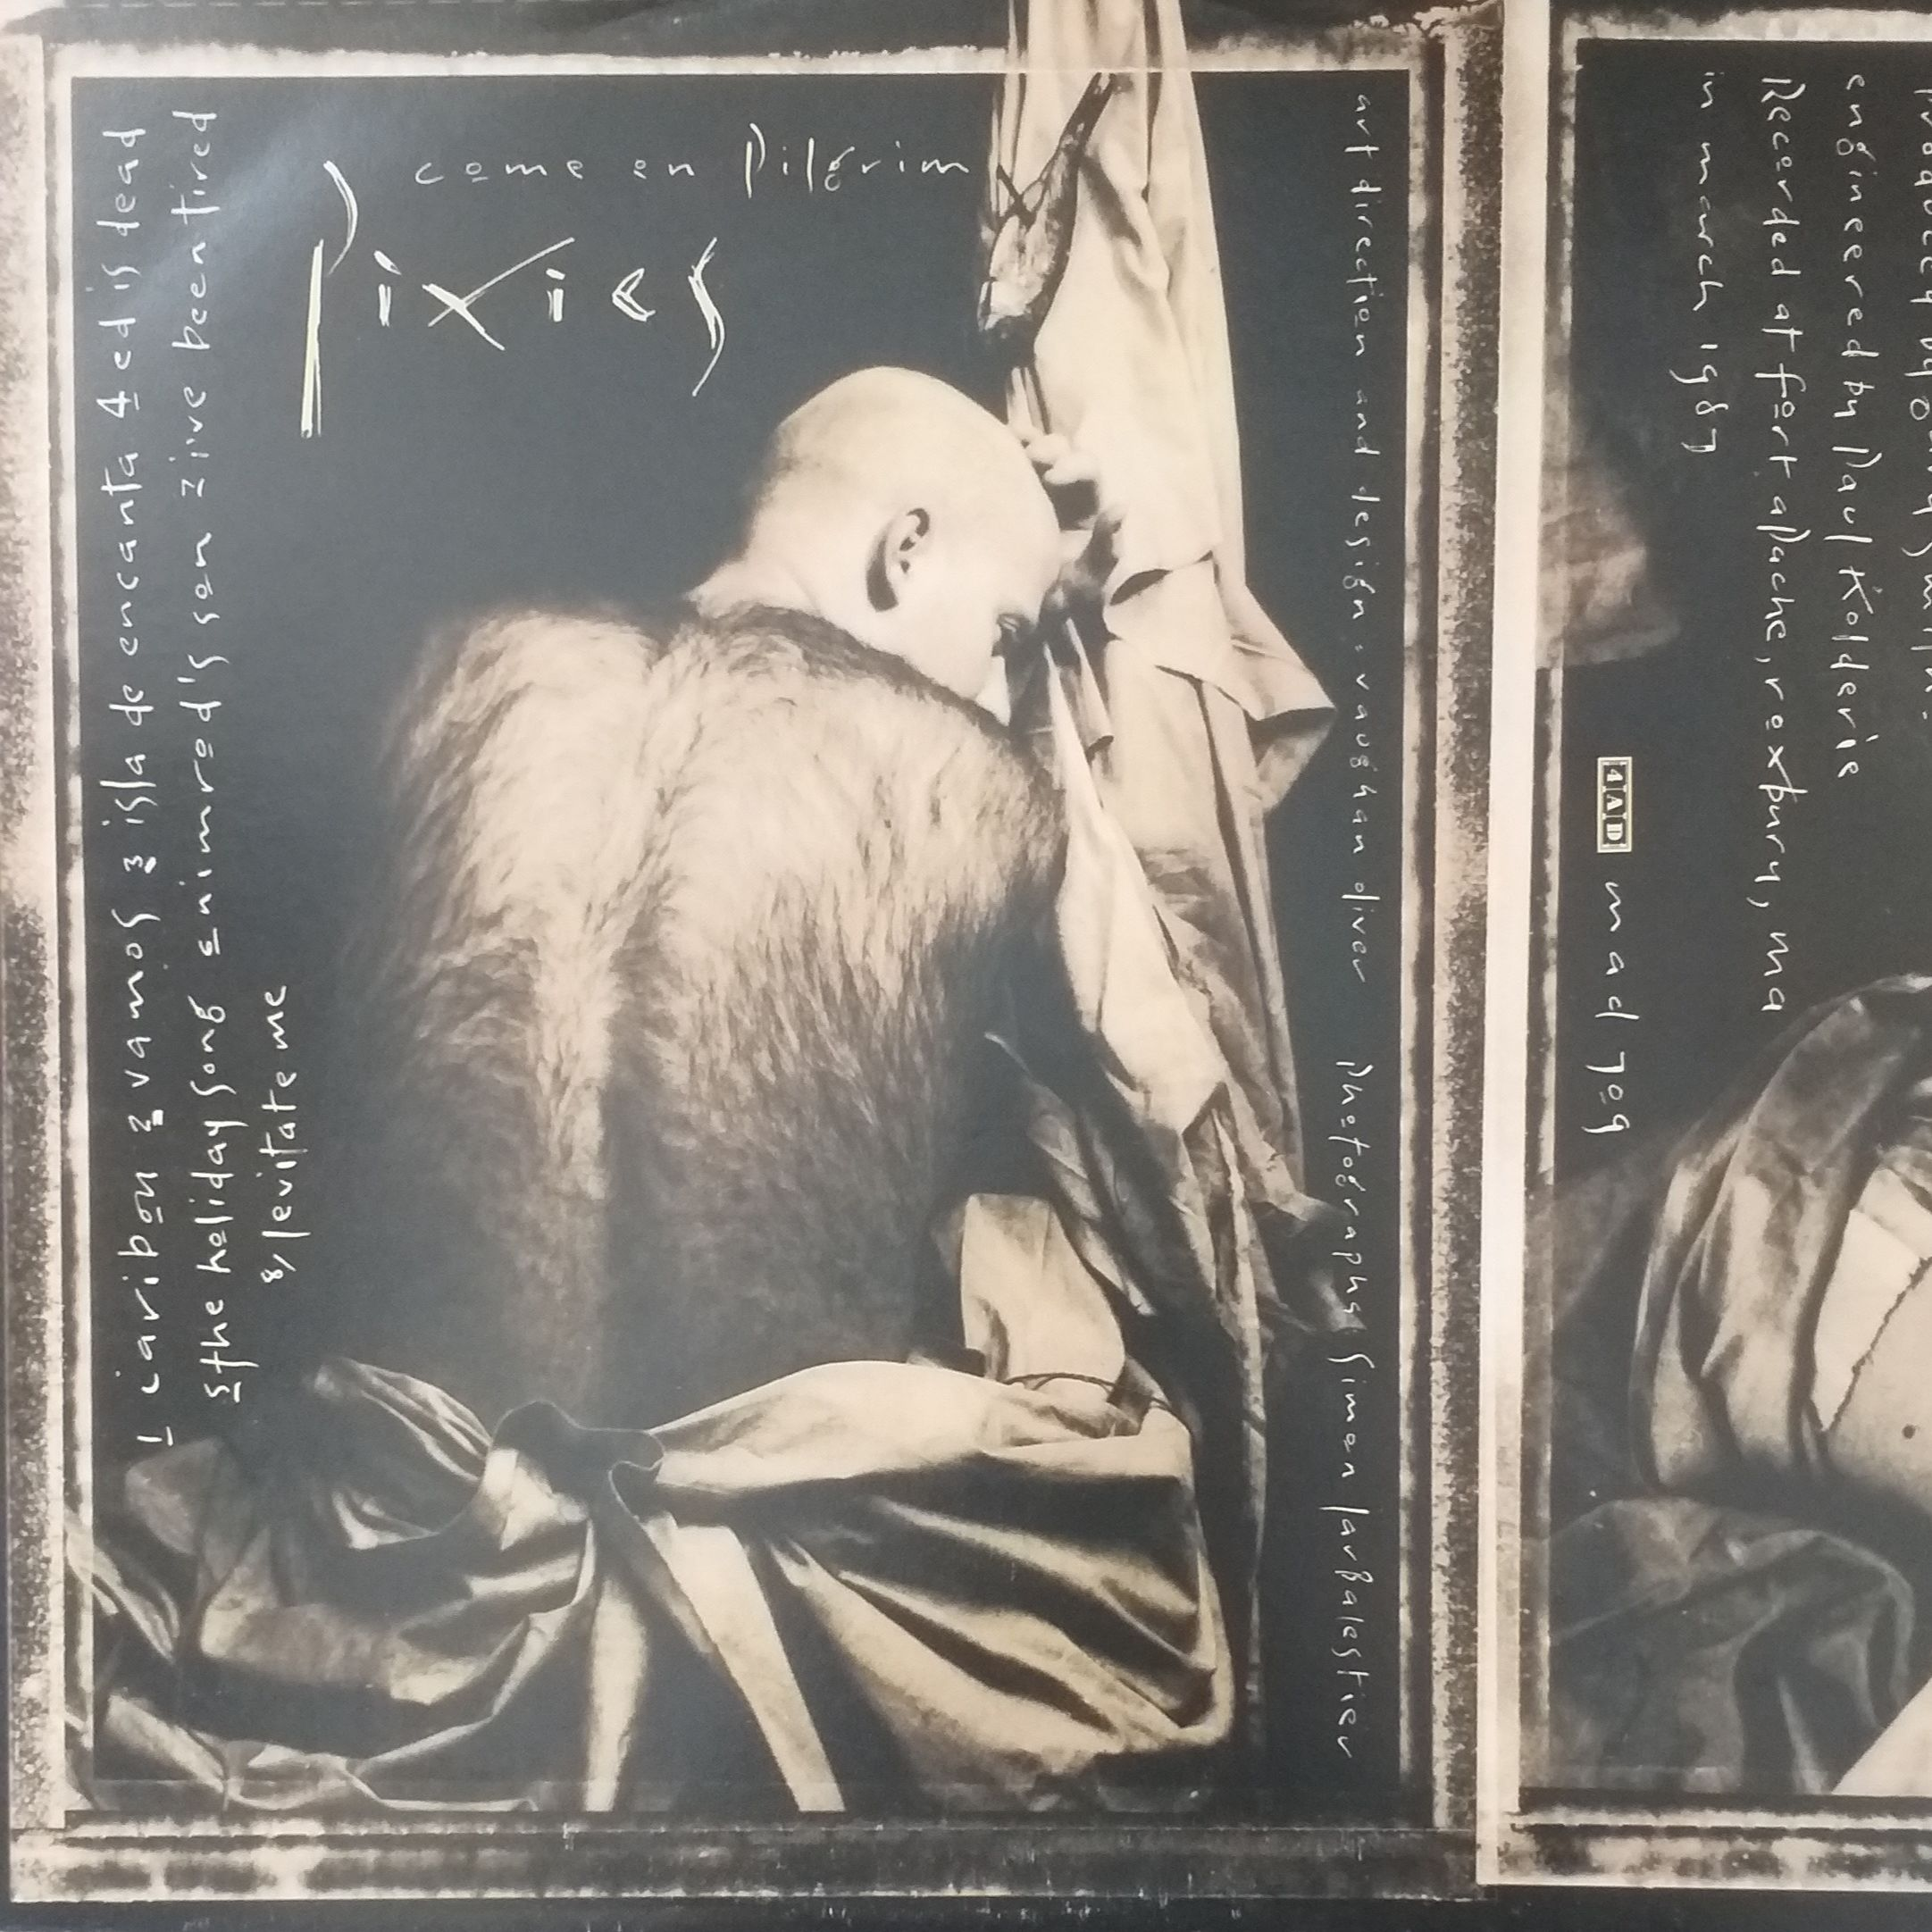 Pixies Come on pilgrim LP undefined